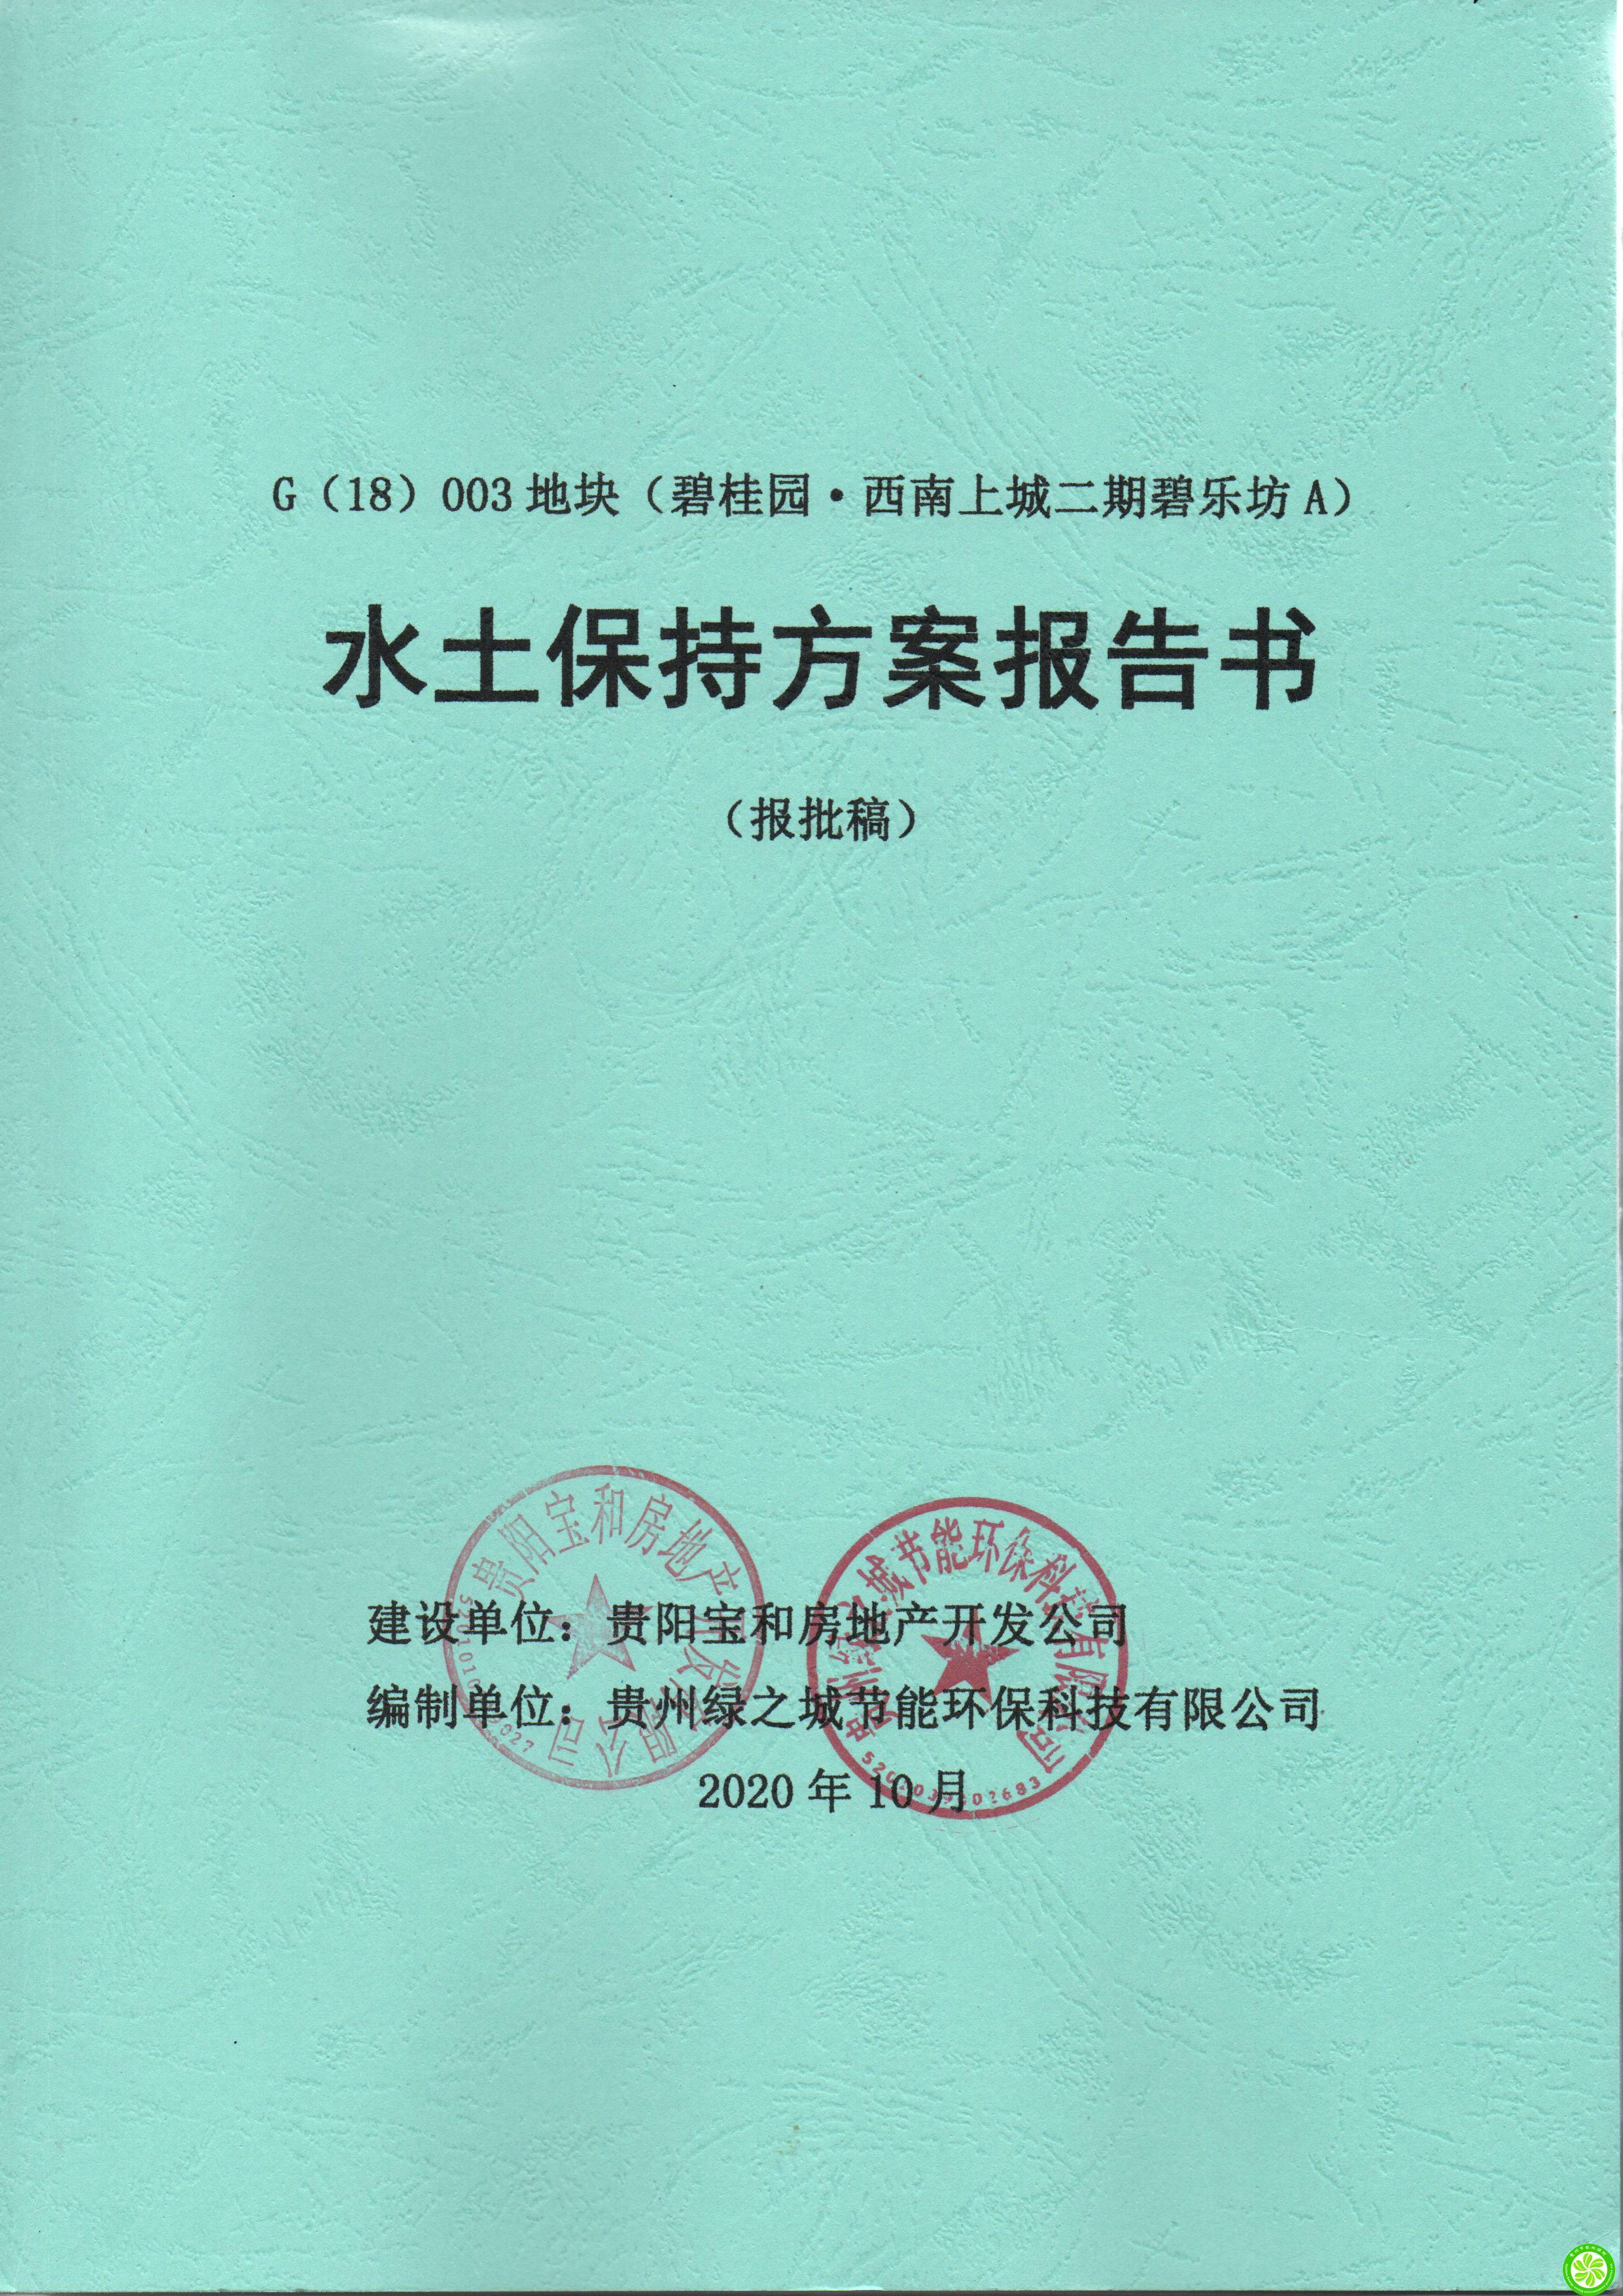 G(18)003地块(碧桂园·西南上城二期碧乐坊A)水土保持方案报告书